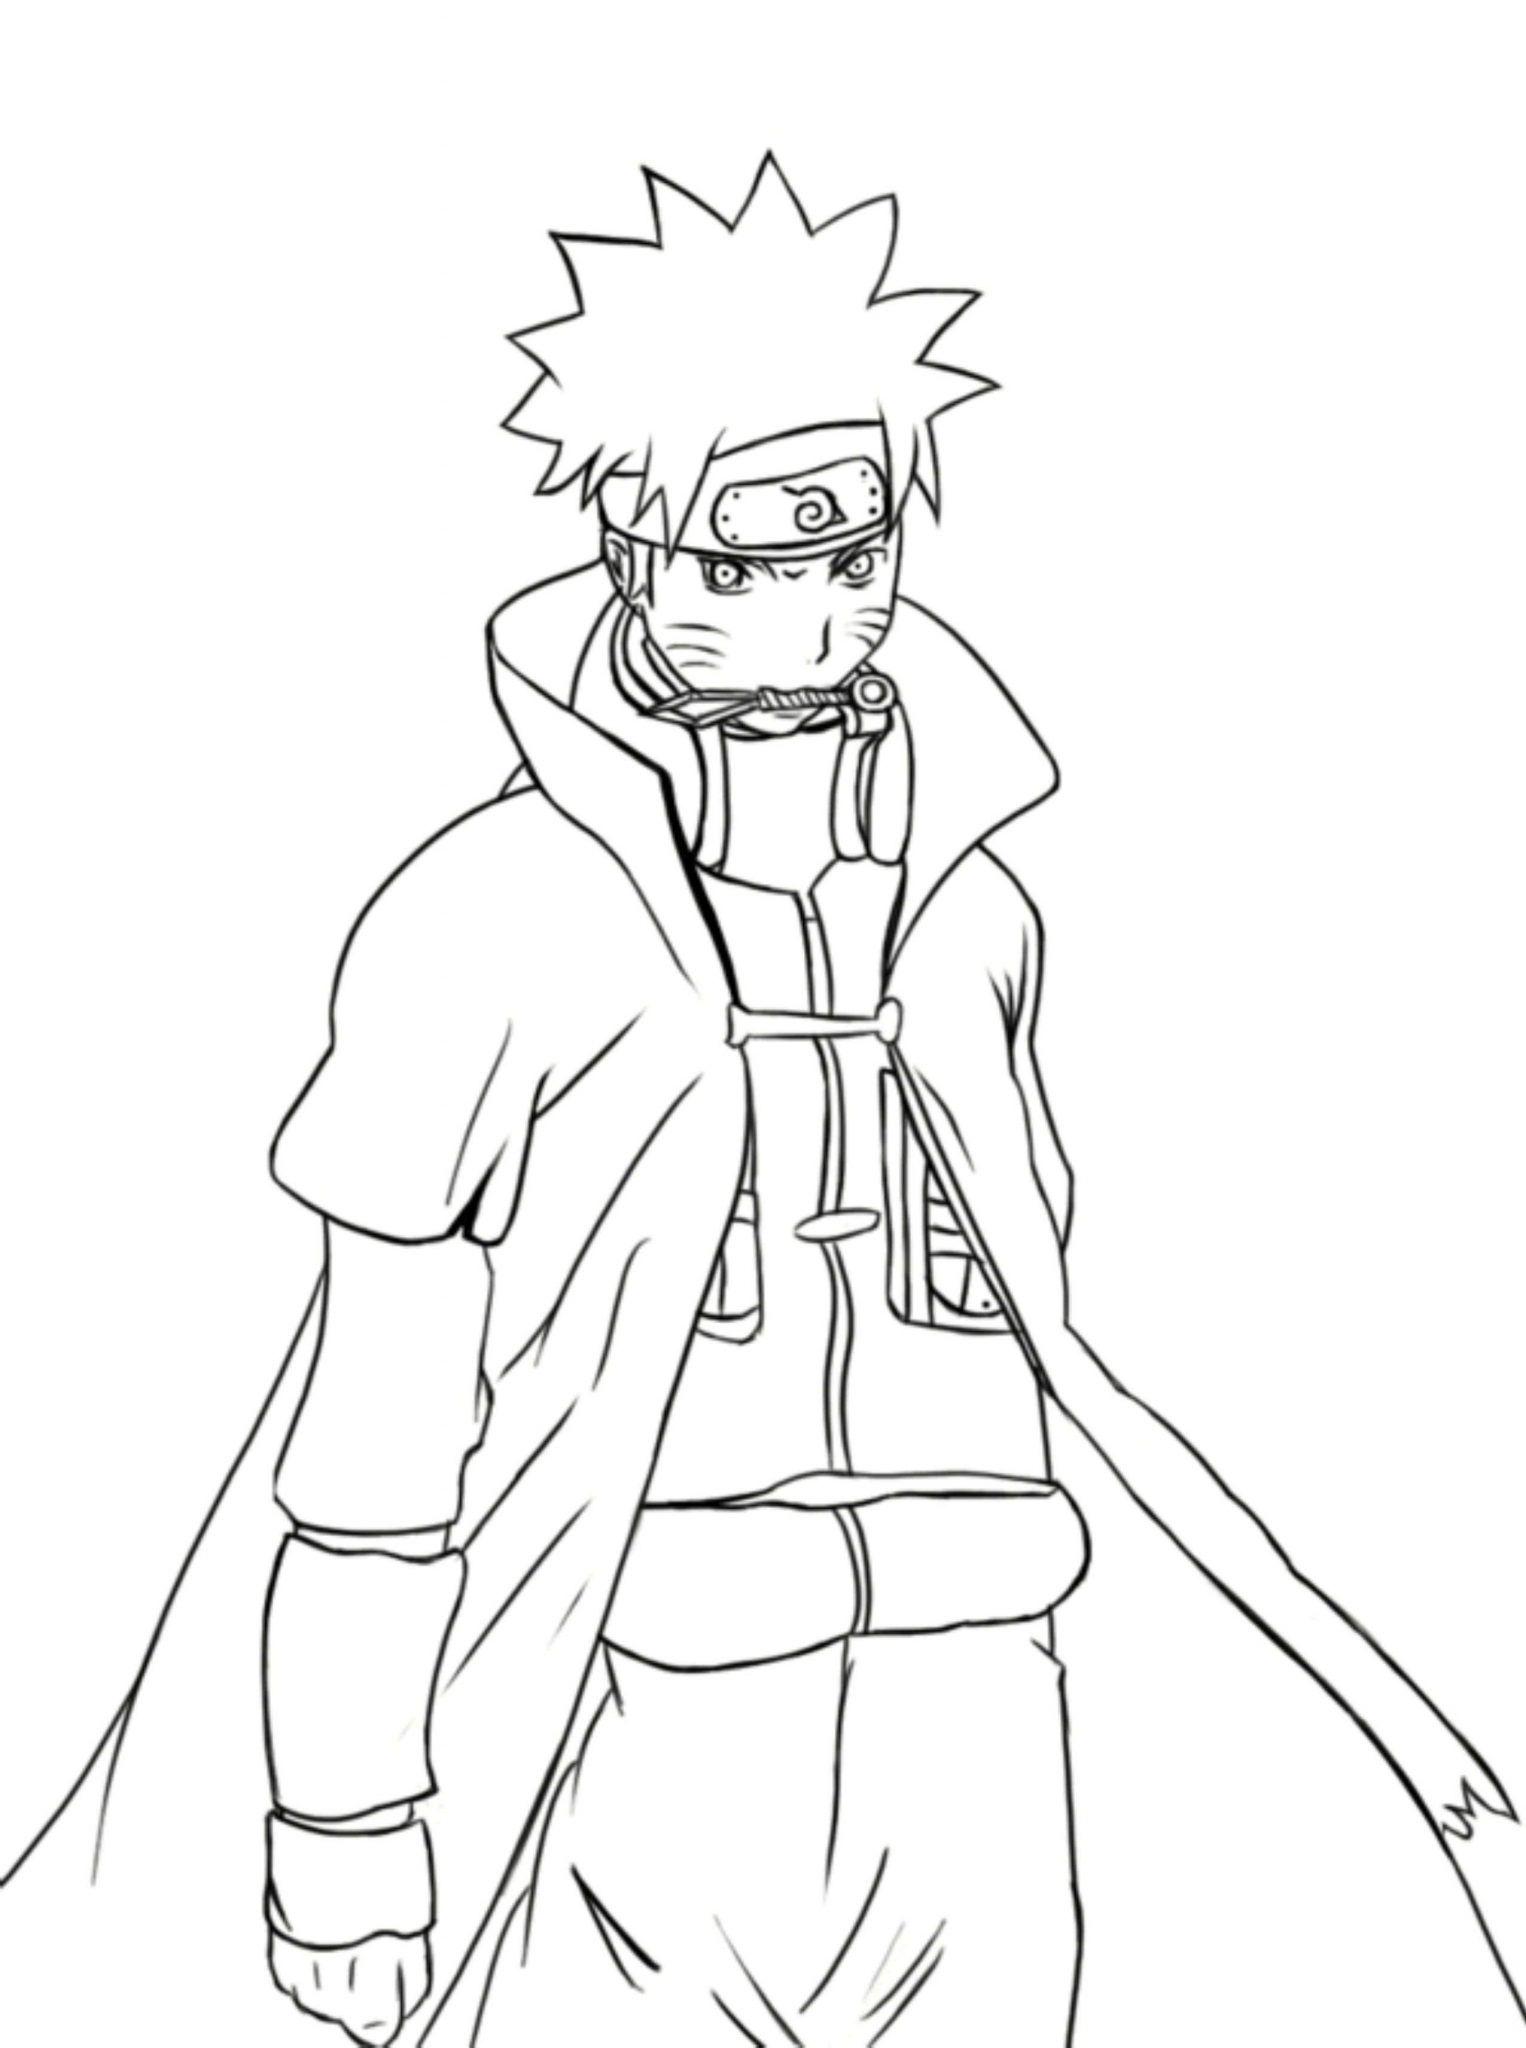 Naruto Shippuuden Coloring Pages Printable Cartoon